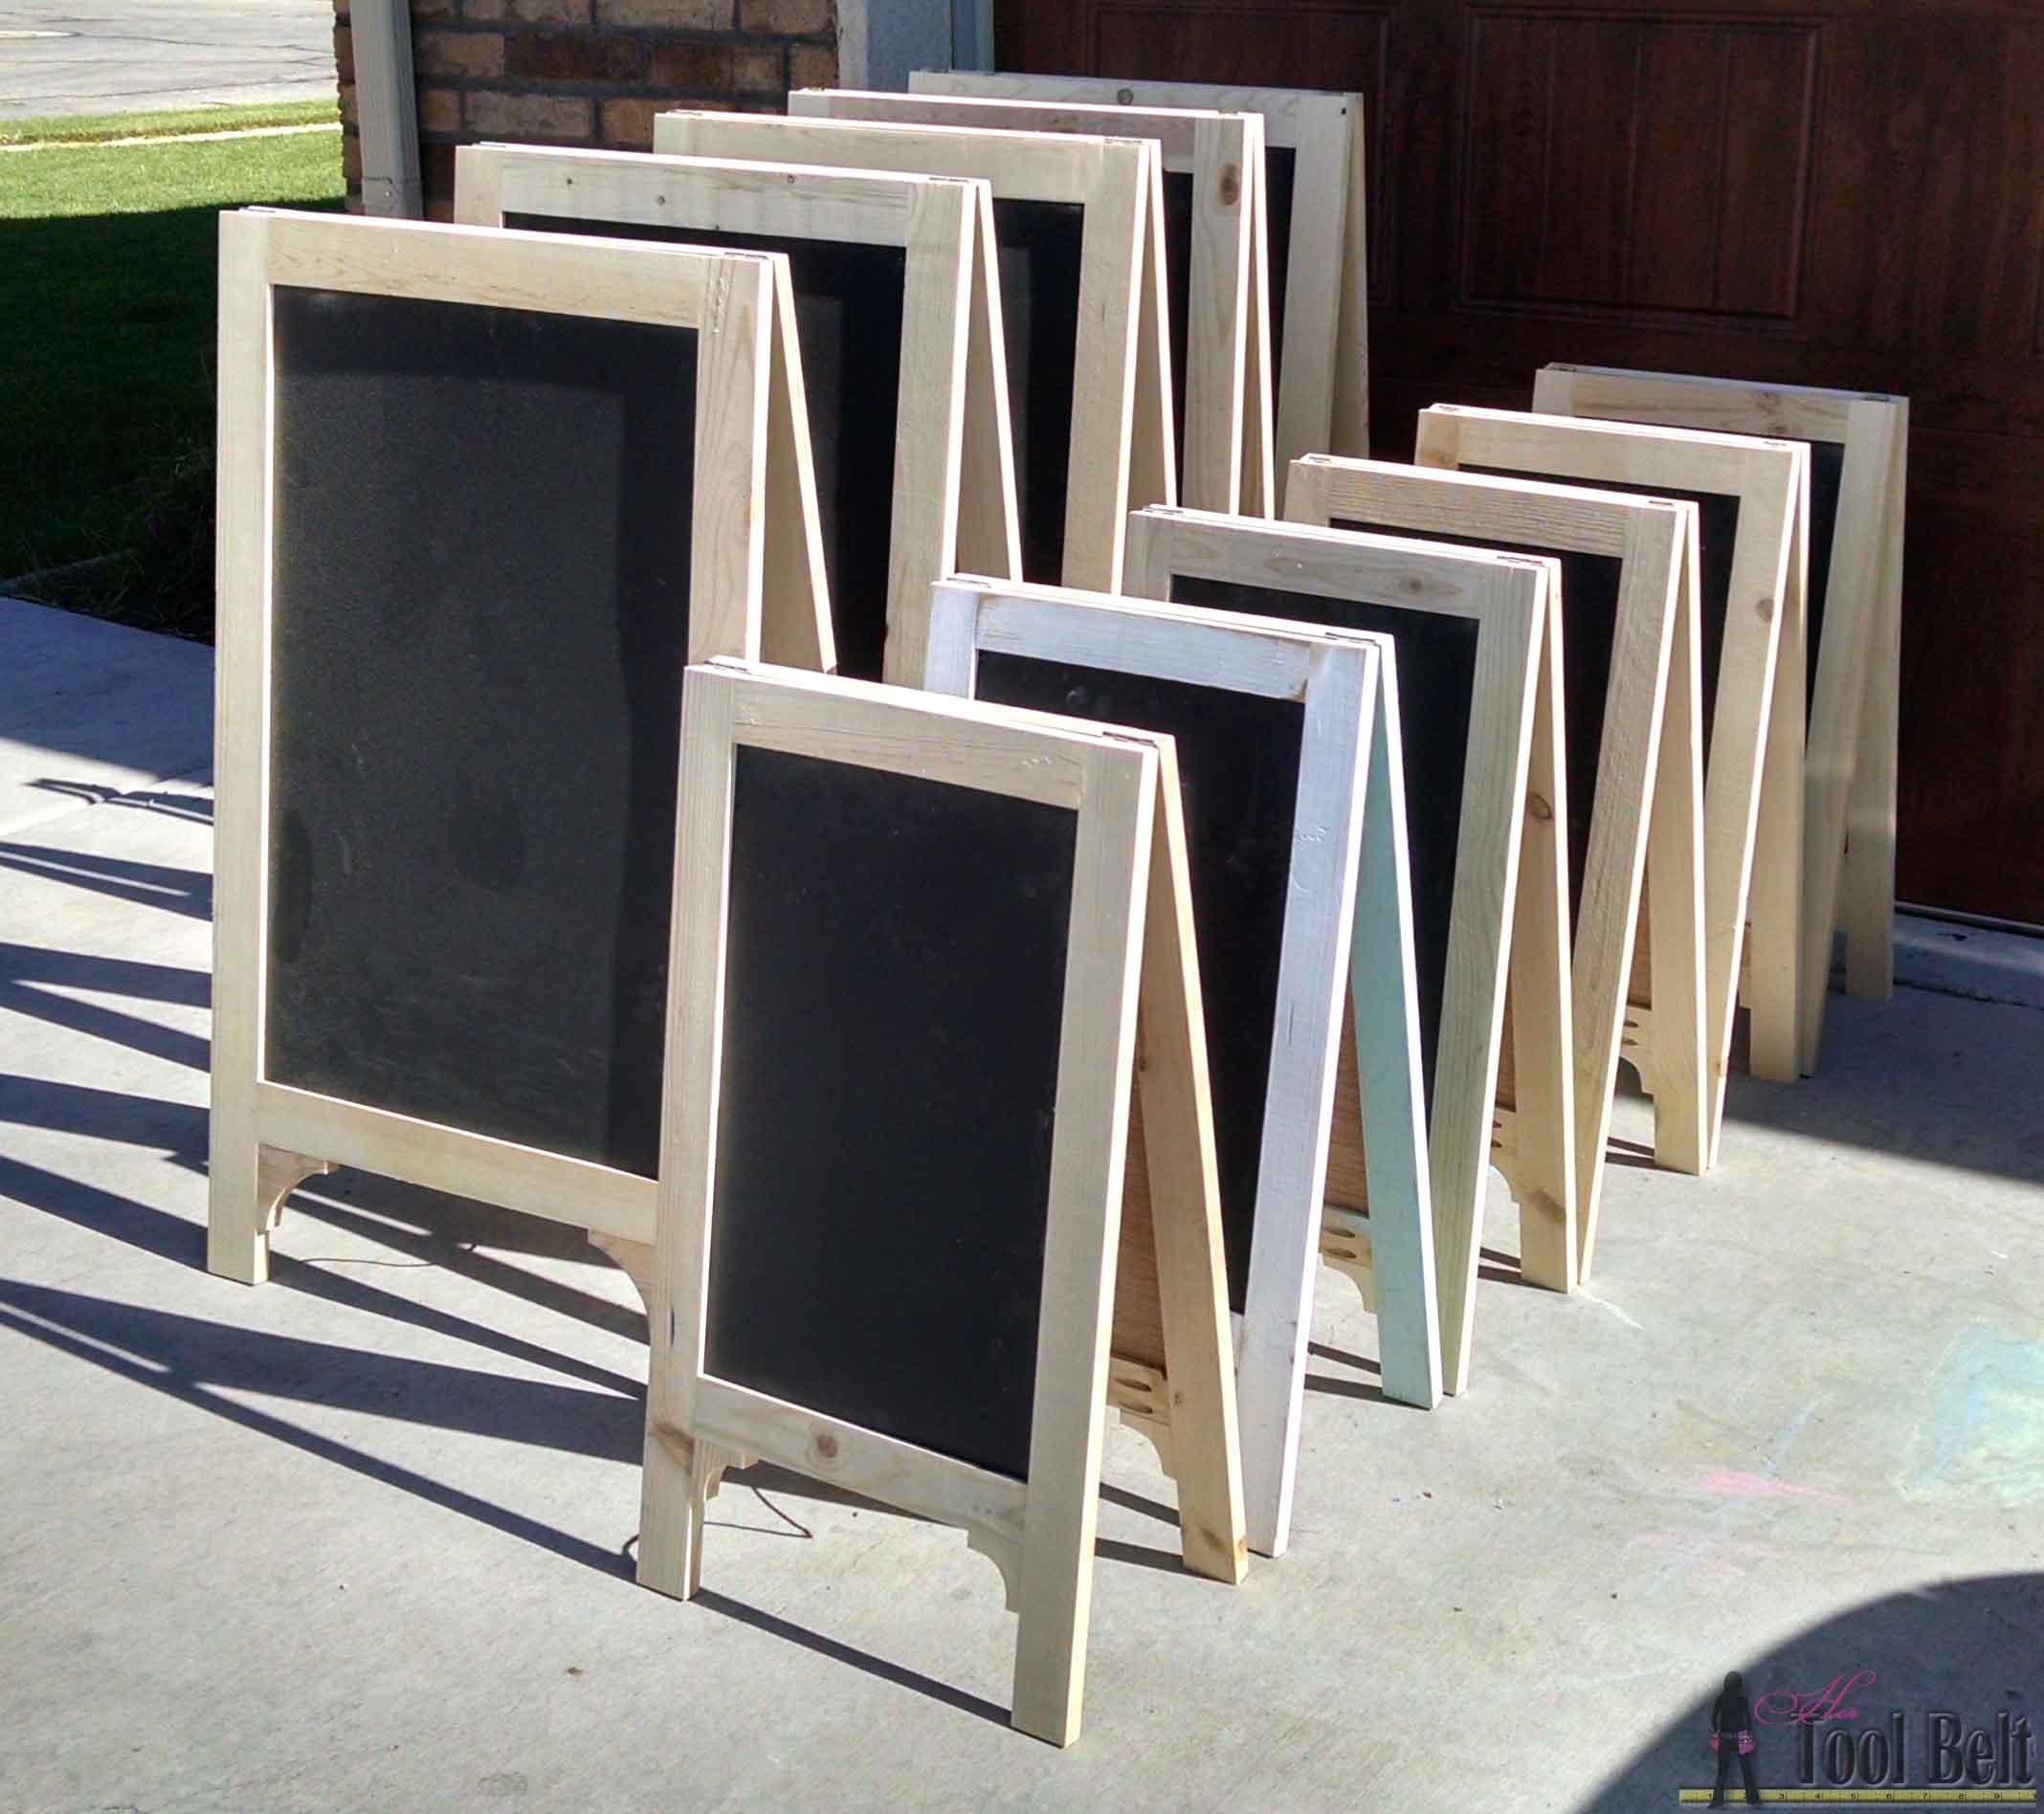 A Frame Chalkboard Easel Small Her Tool Belt